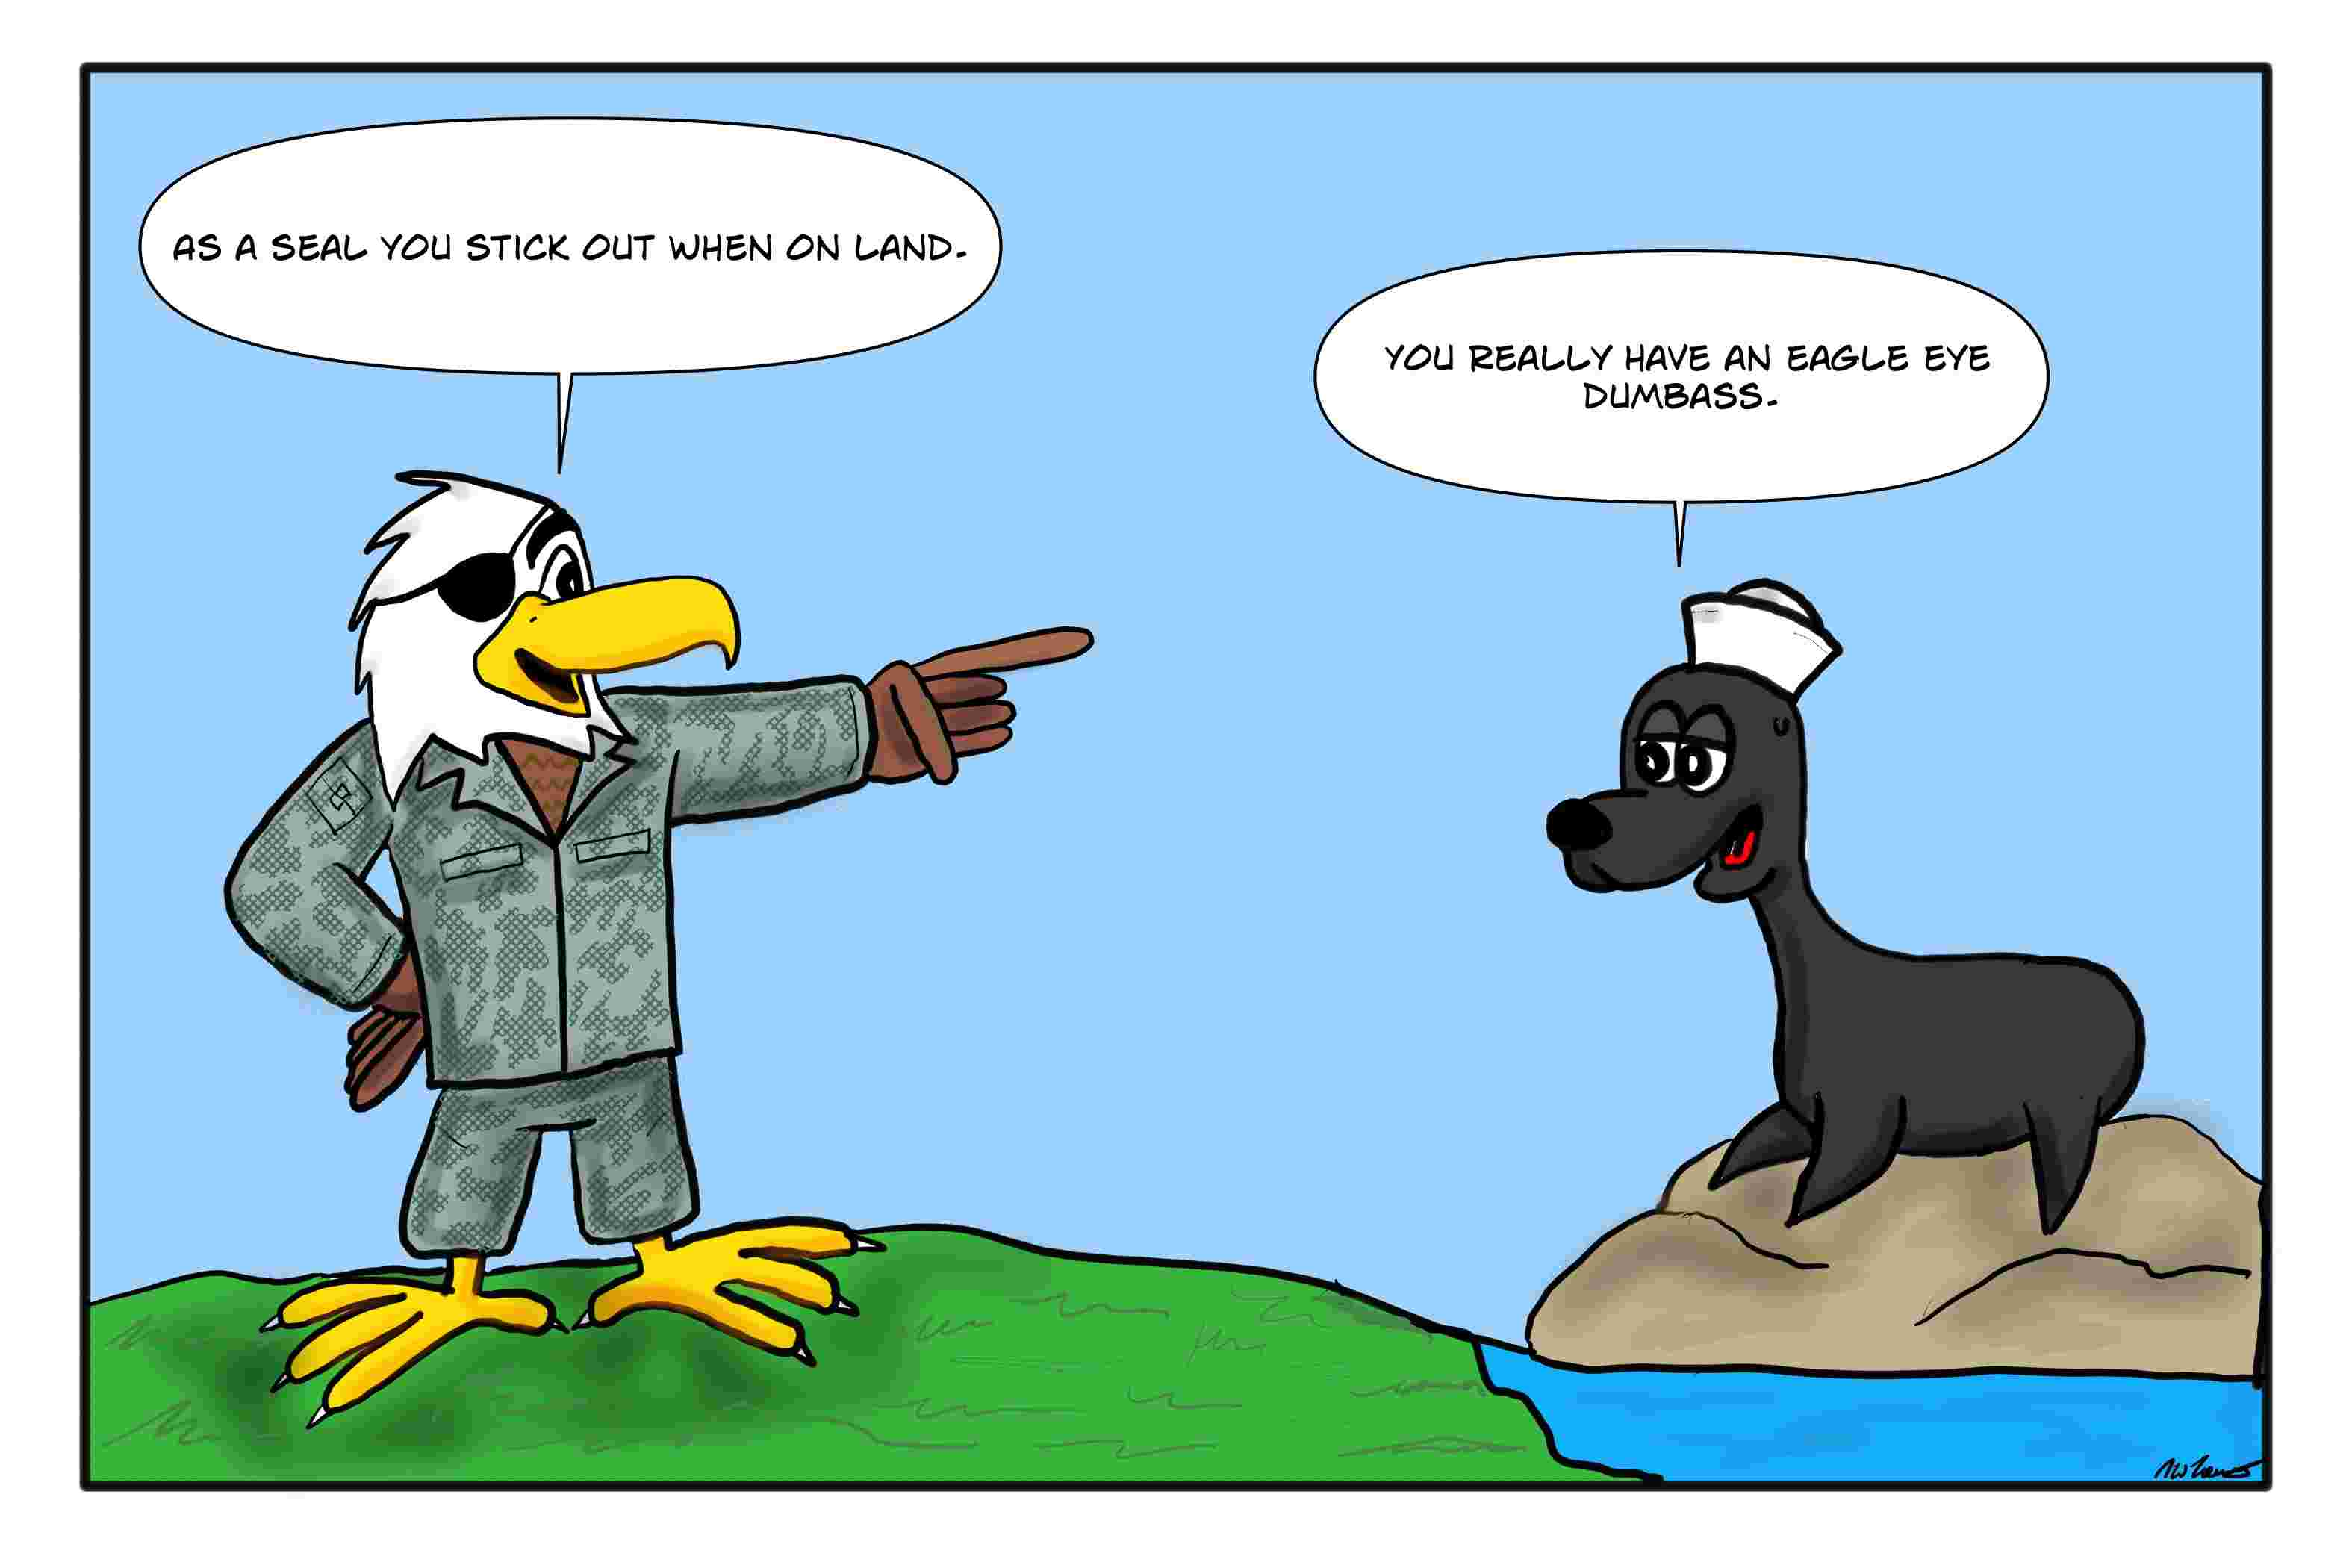 air-force-eagle-eye-navy-seal